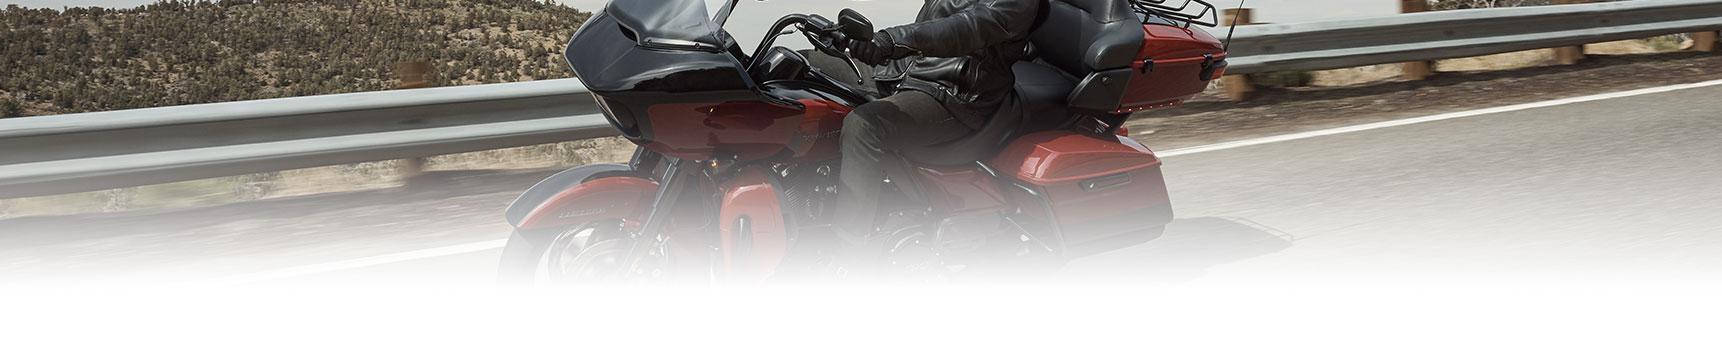 Community giving at M & S Harley-Davidson